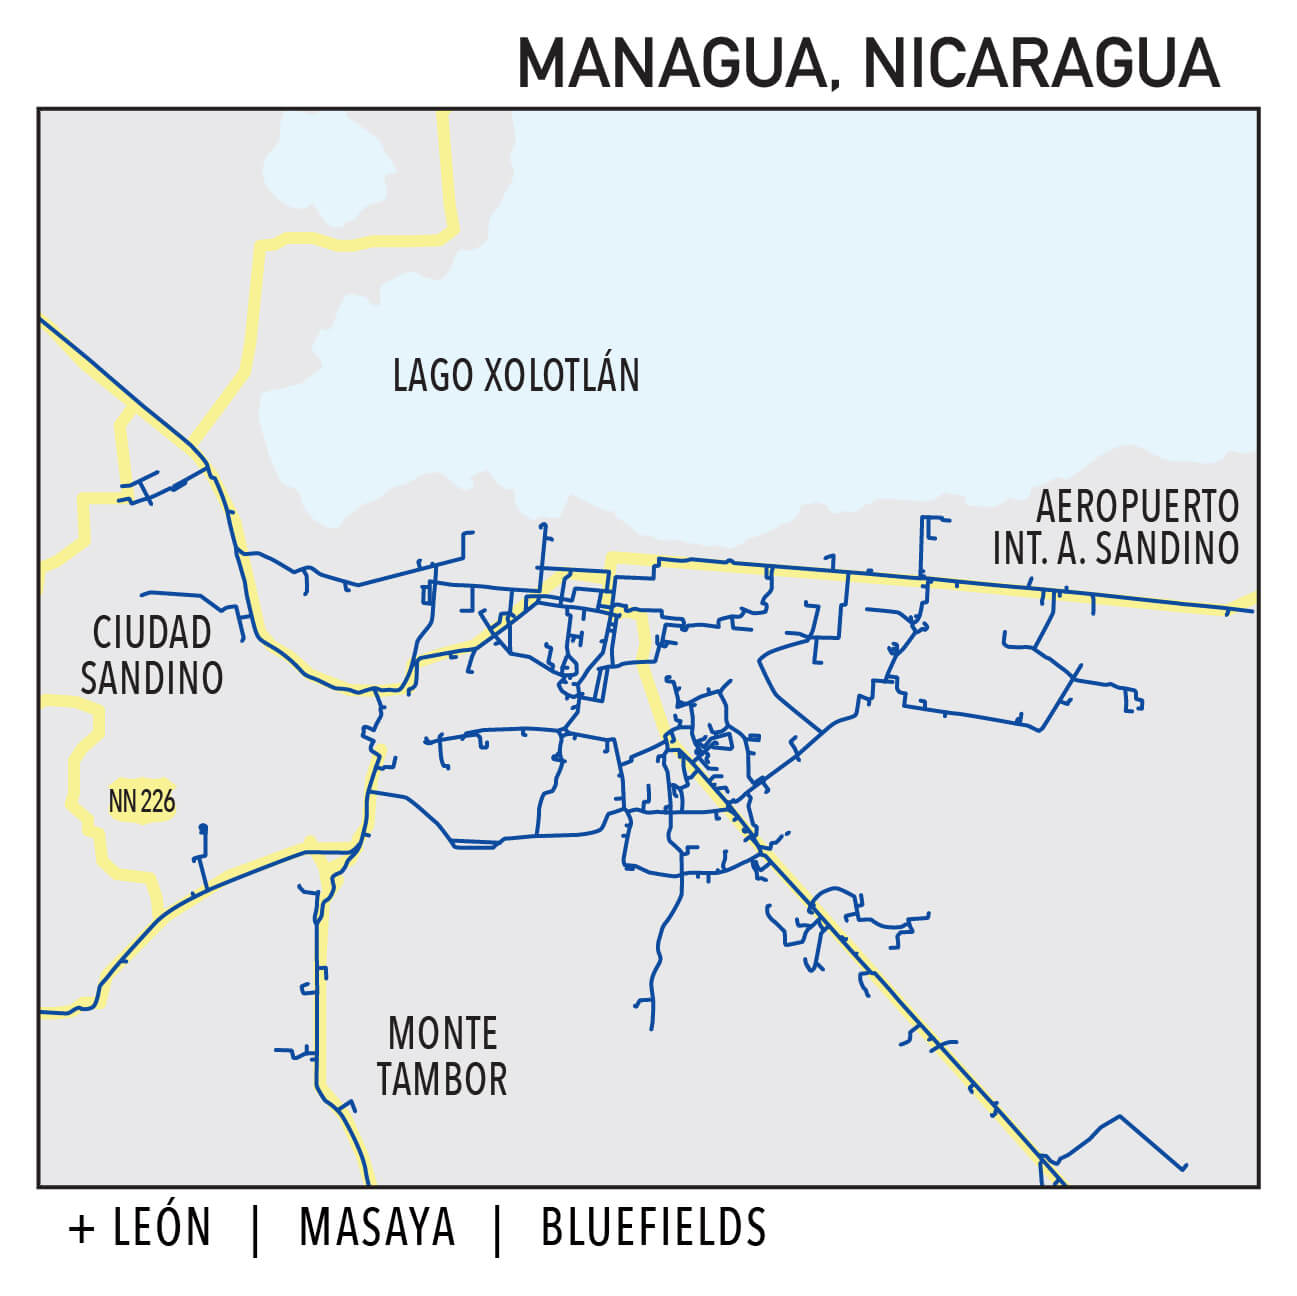 Capillarity Nicaragua map Ufinet